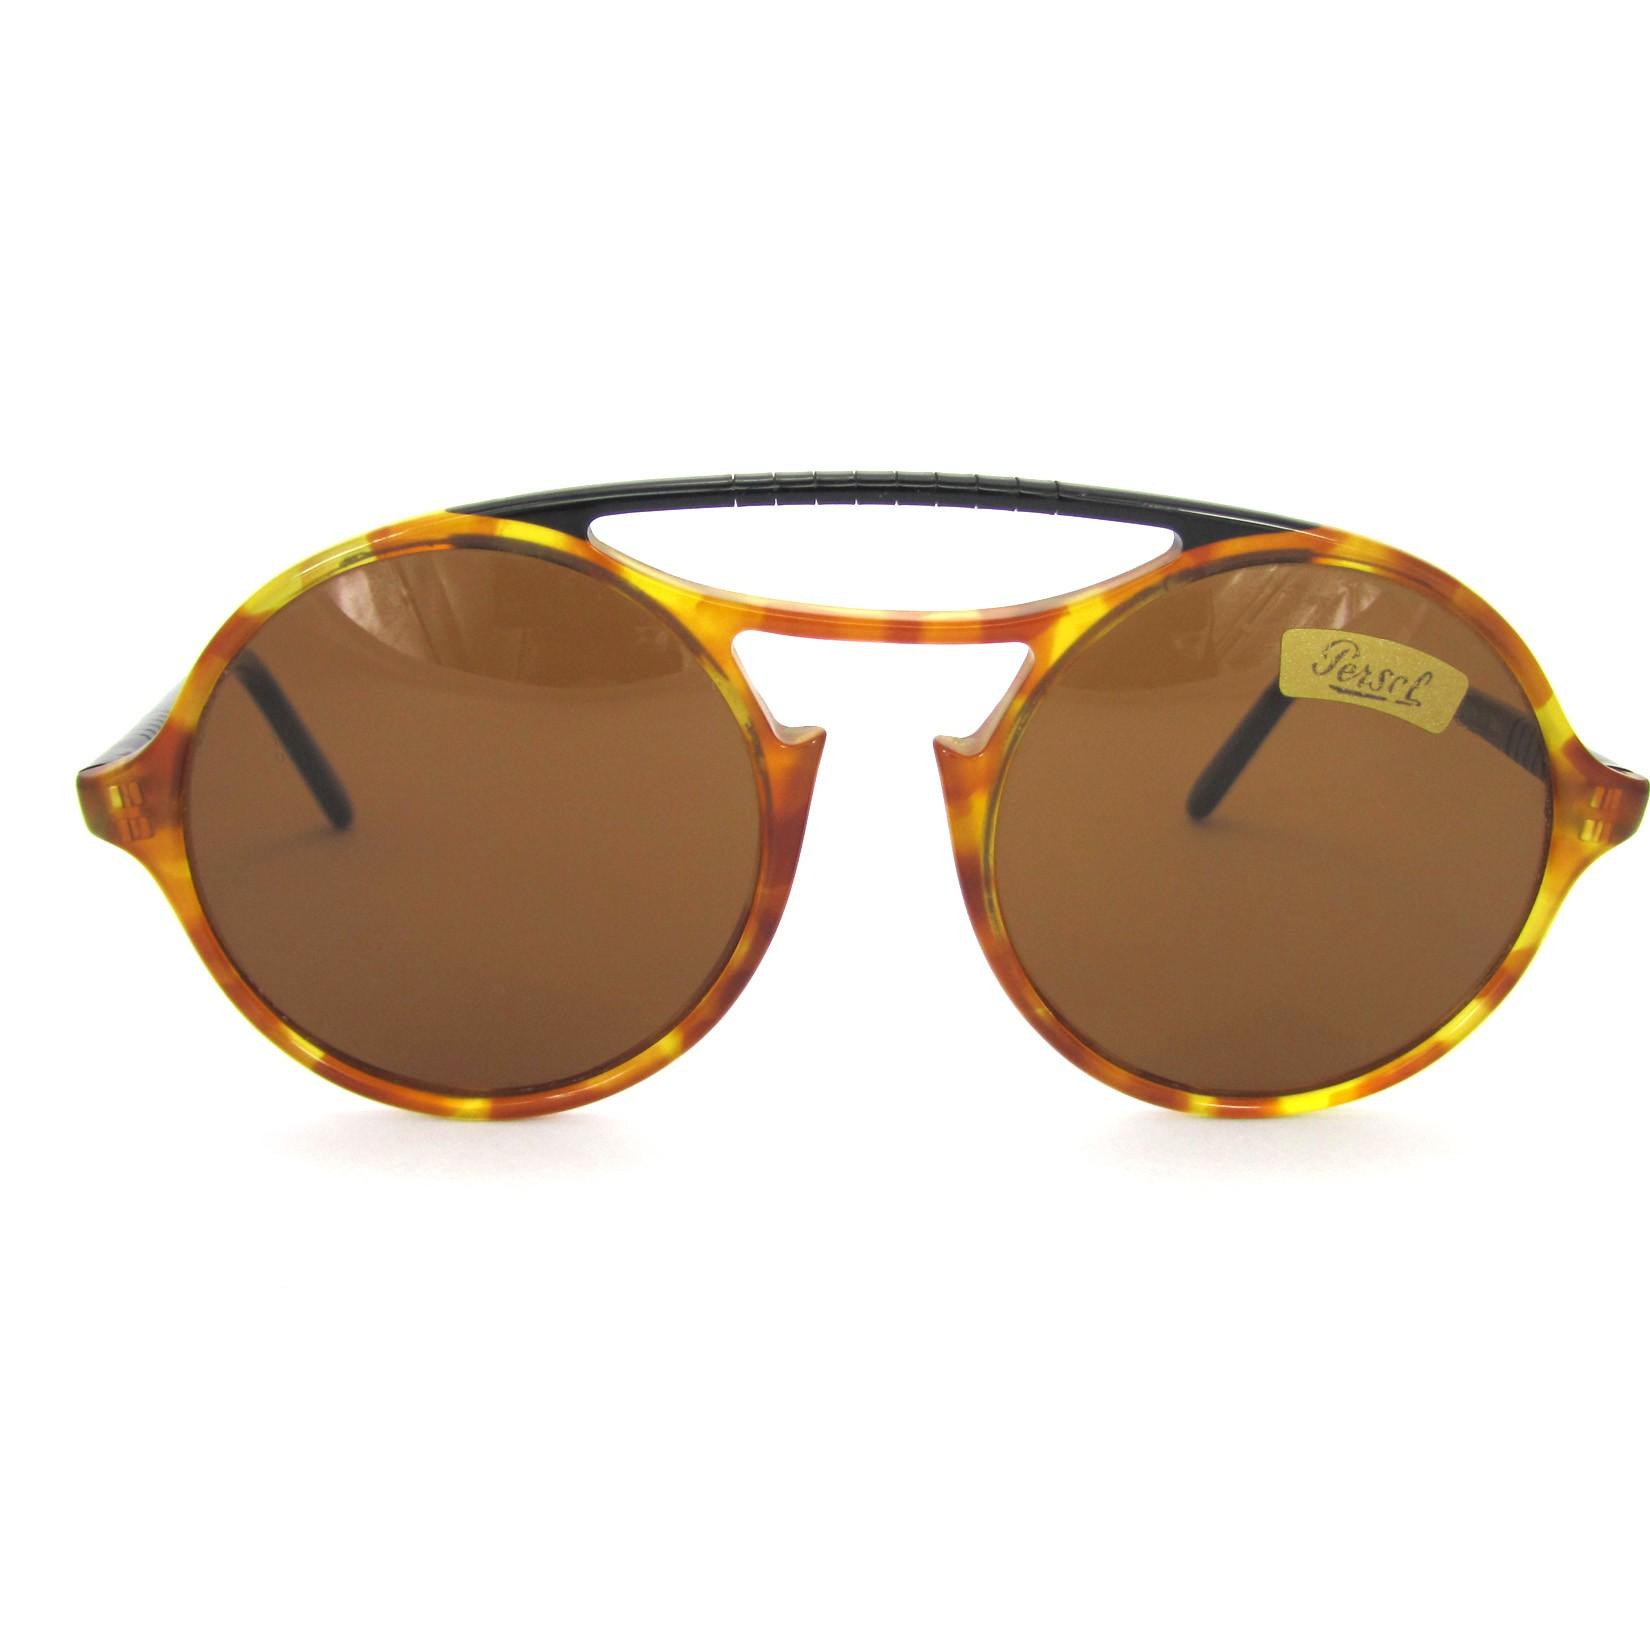 c5789dc3d3d4 Buy Online Vintage Sunglasses and Eyeglass Frames